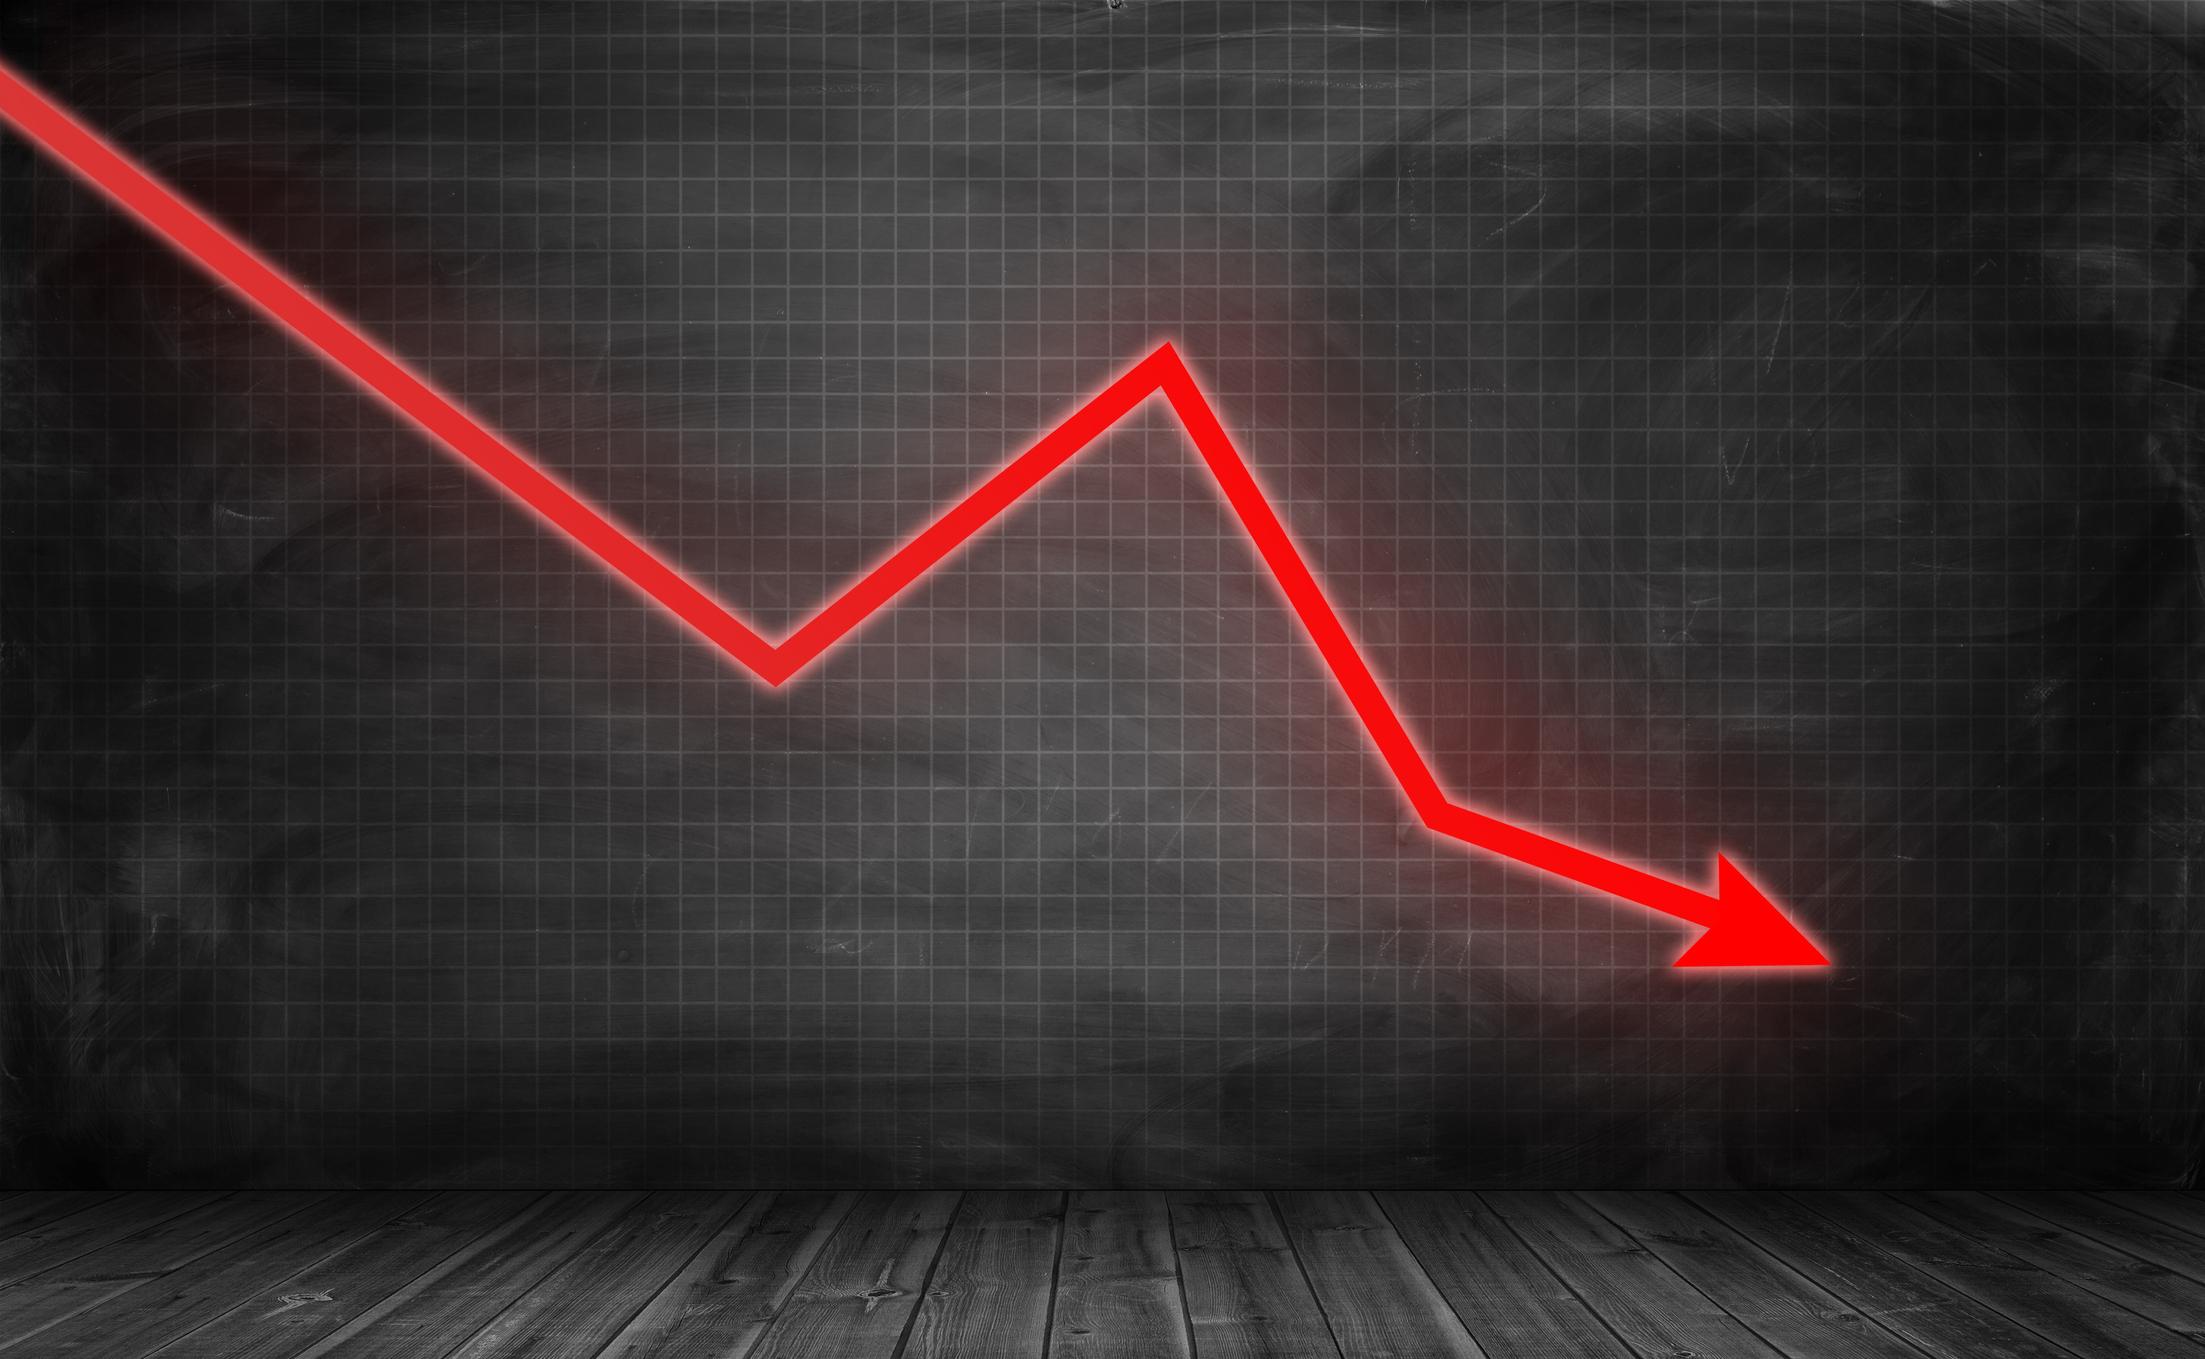 Adt Inc Adt Stock Price News The Motley Fool